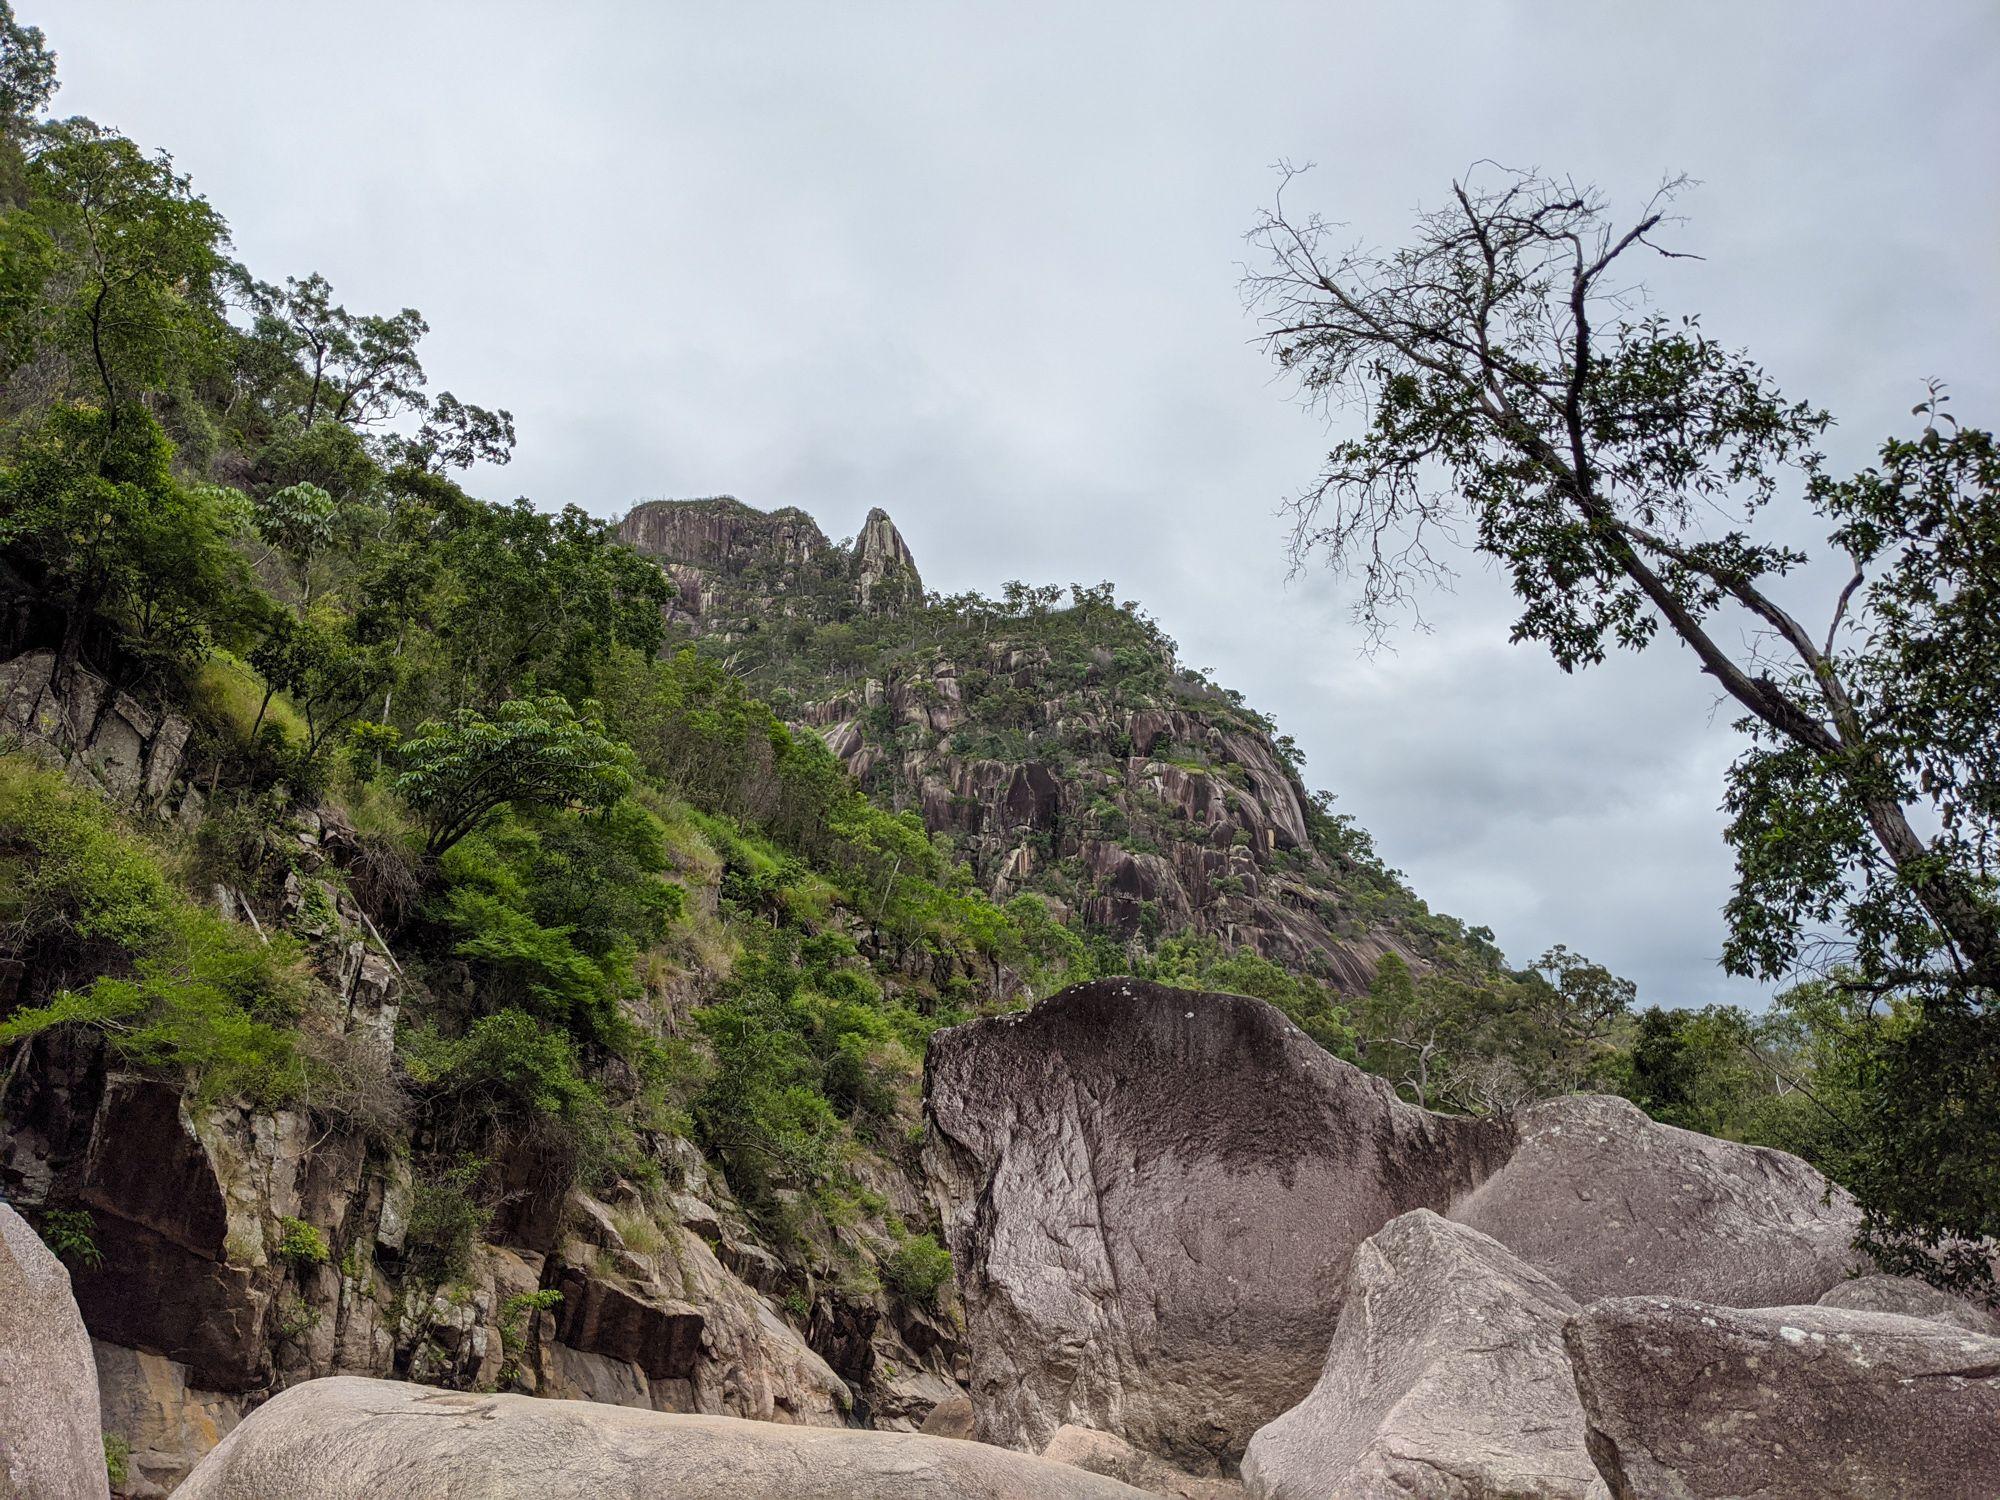 disaster creek large boulders